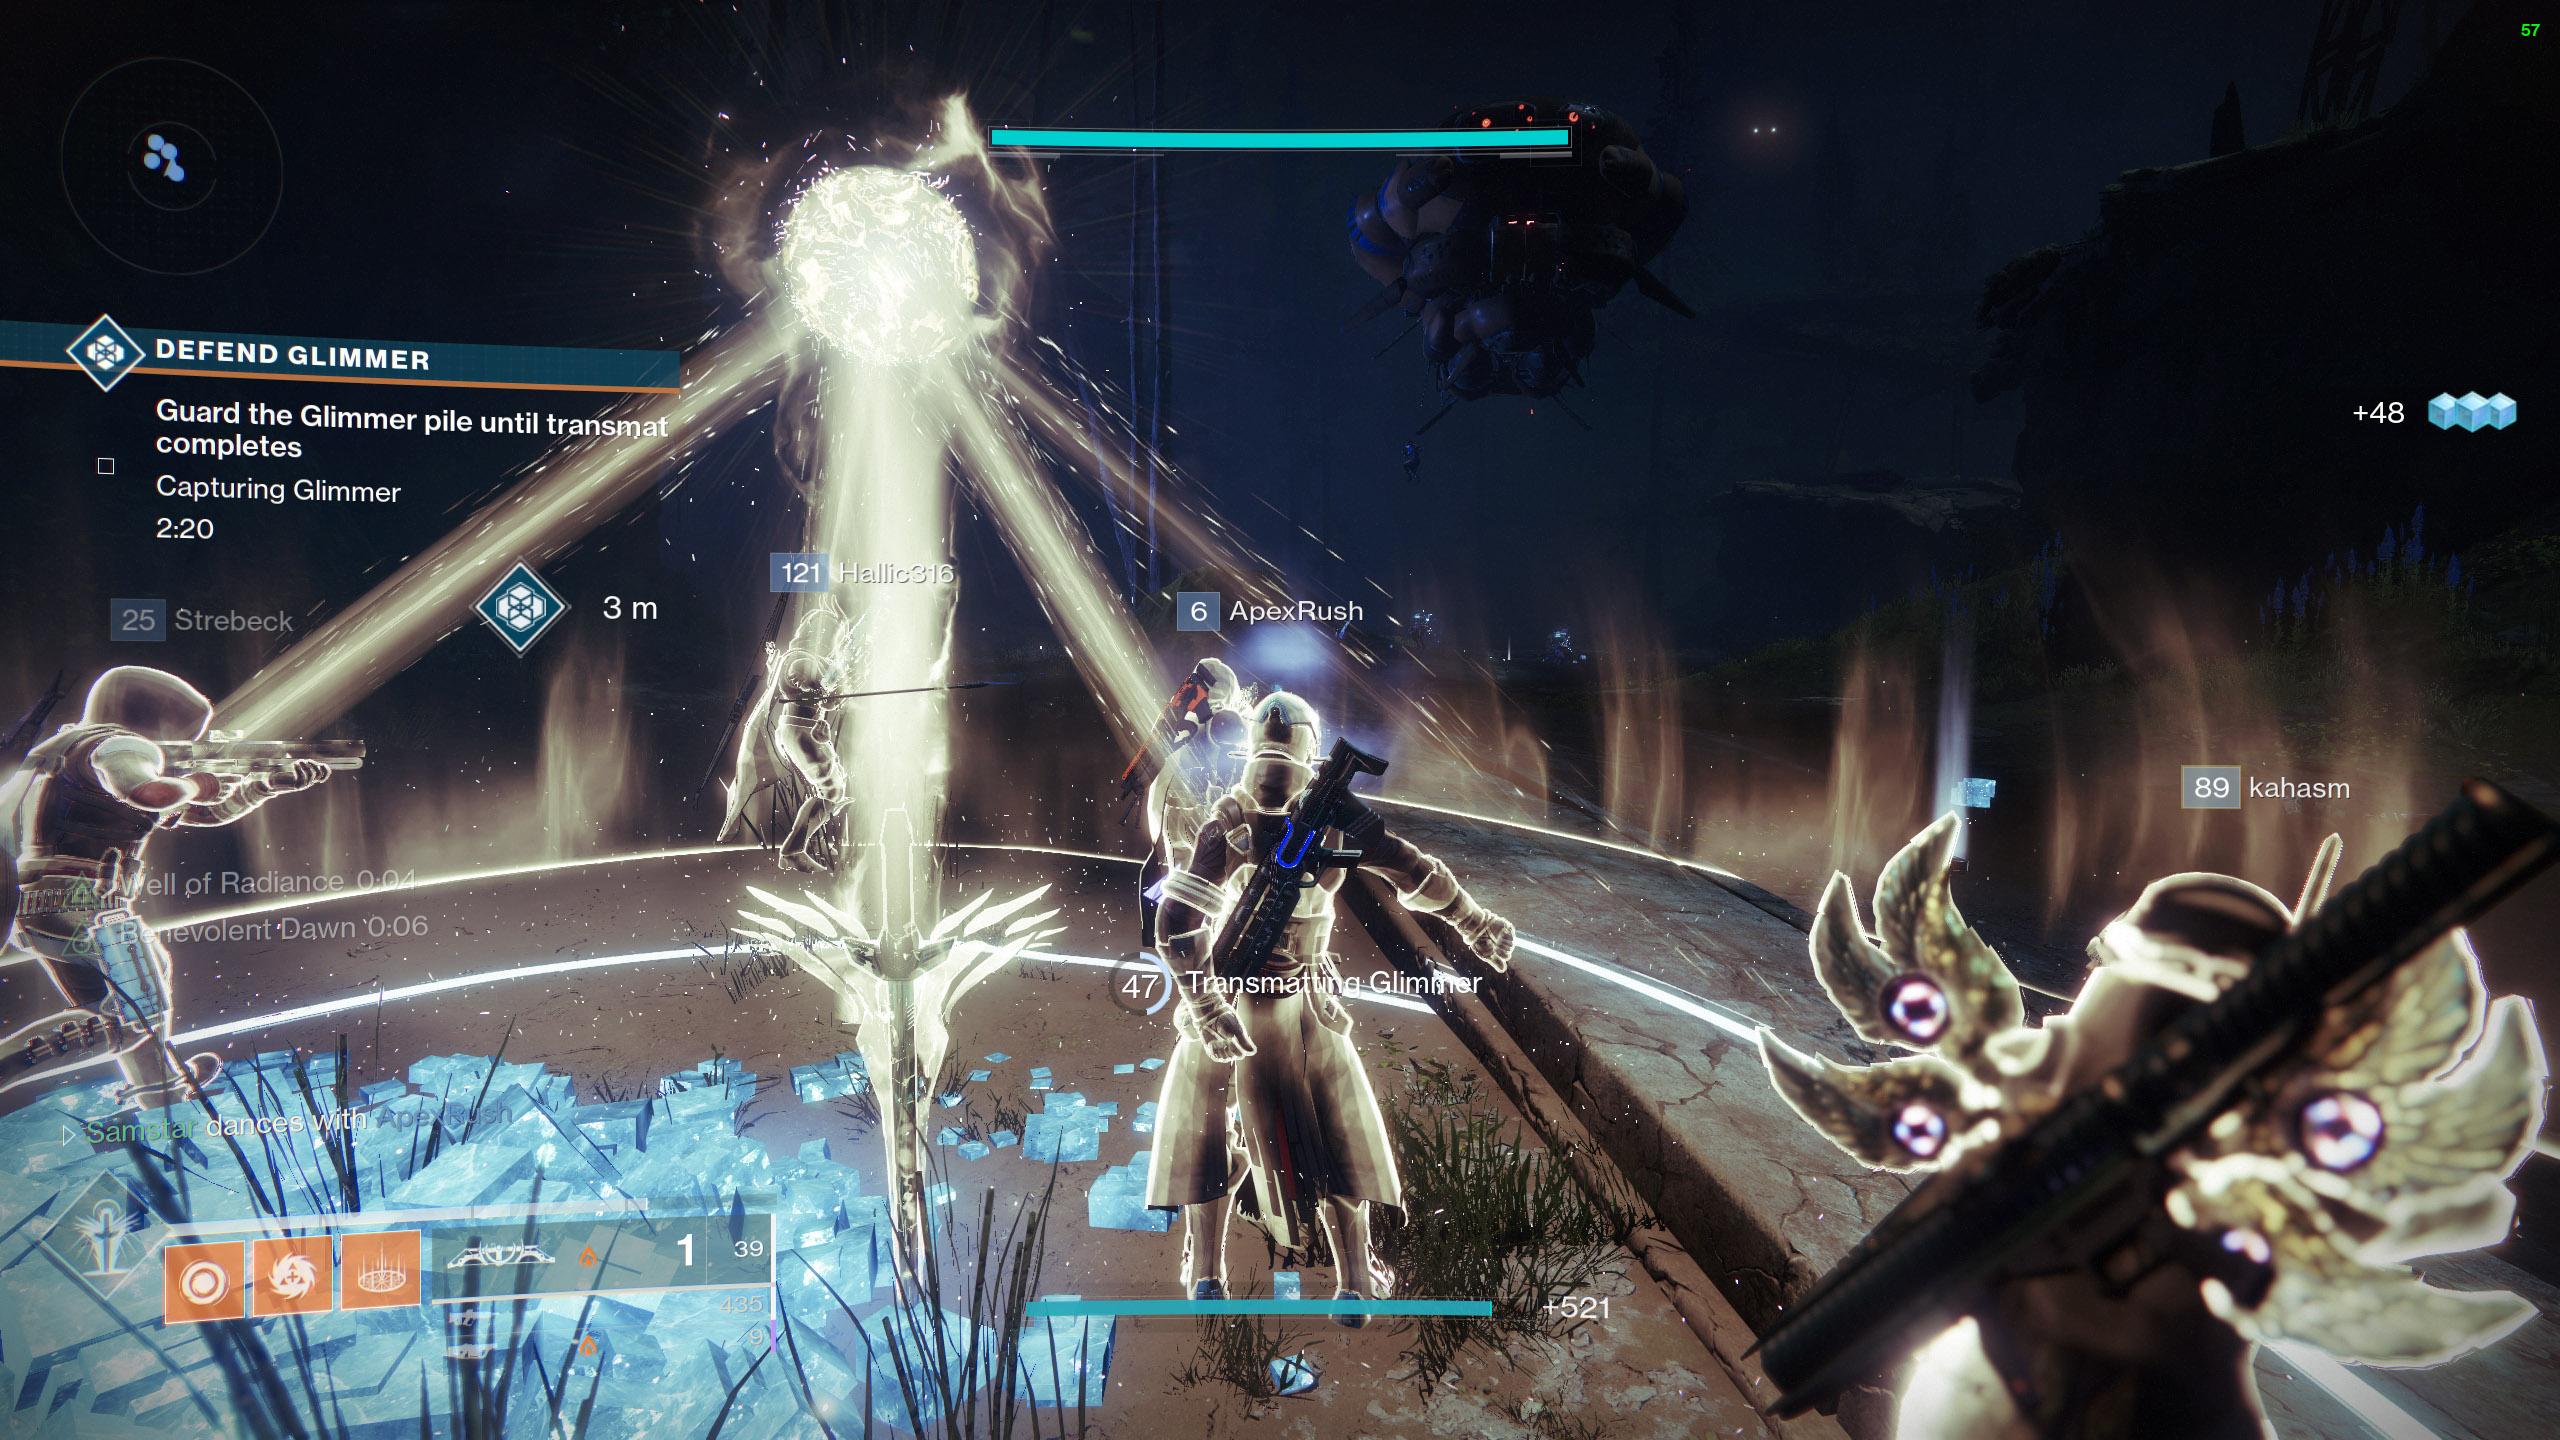 destiny 2 phoenix protocol when to use